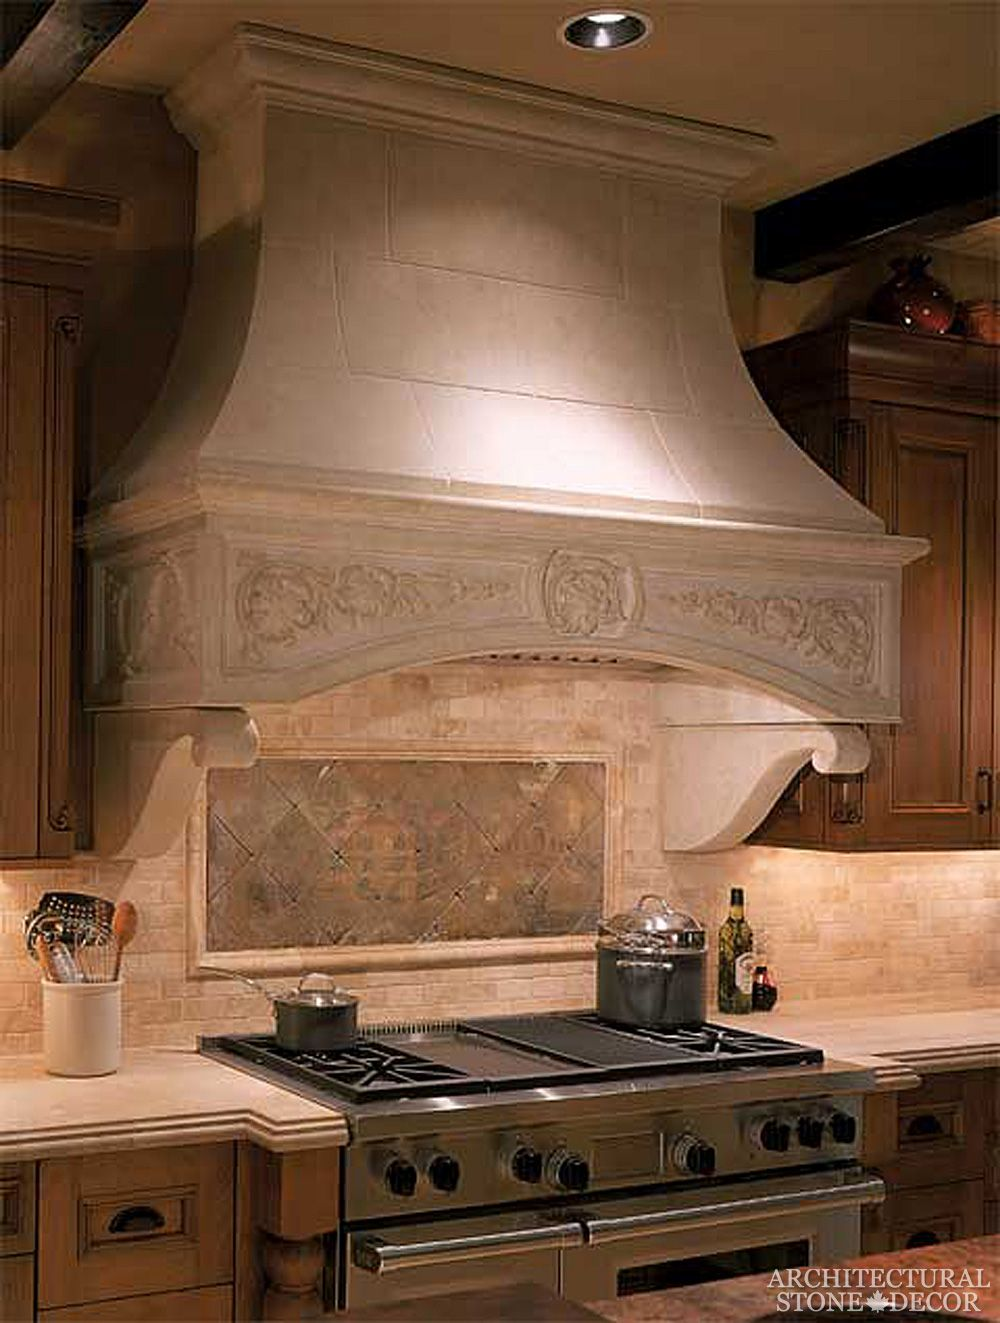 Kitchen Counter Topss Hoods Stone Limestone Antique Hand Carved Stone Range Hood Stone Kitchen Hood Kitchen Hoods